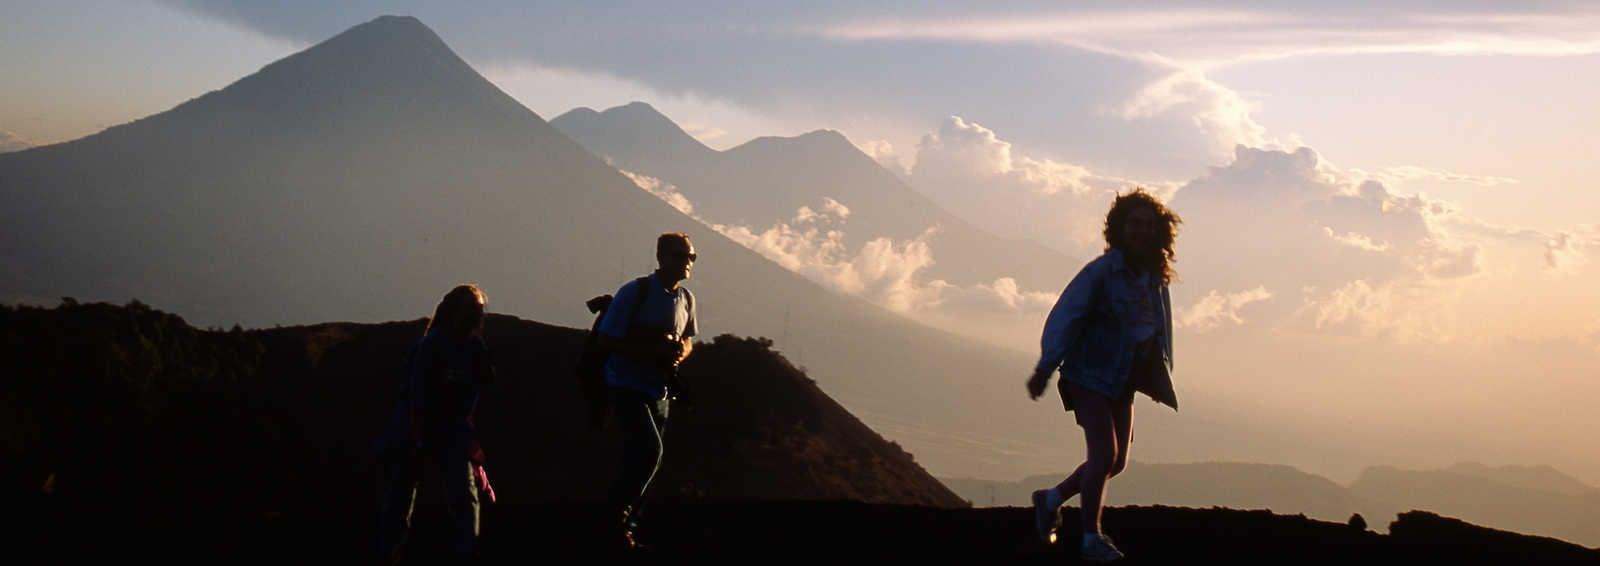 Trekkers on Agua Volcano above Antigua Guatemala